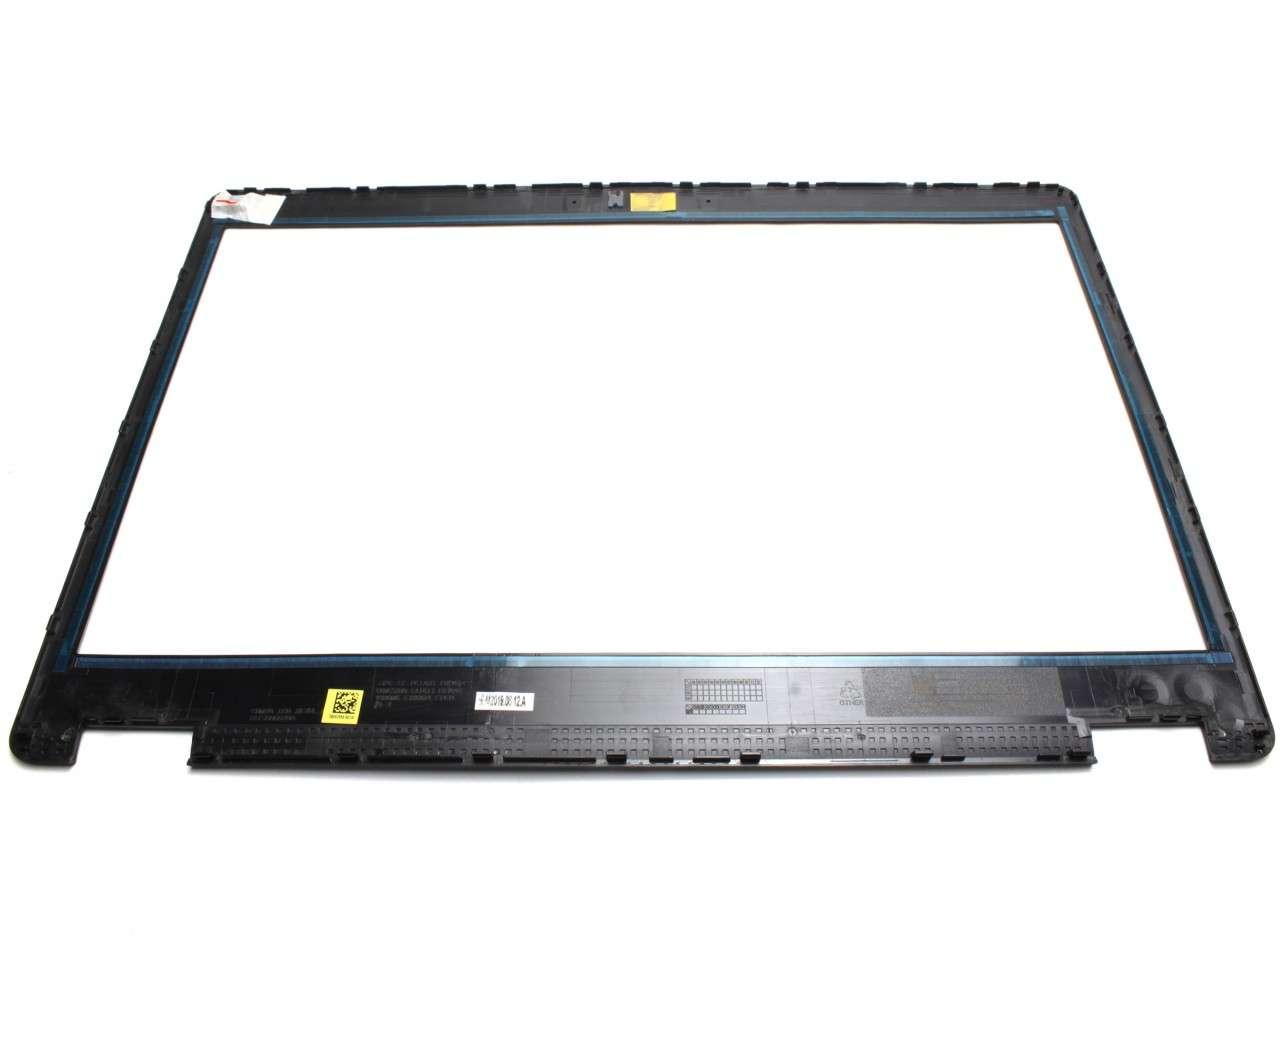 Rama Display Dell Latitude E5450 Bezel Front Cover Neagra imagine powerlaptop.ro 2021